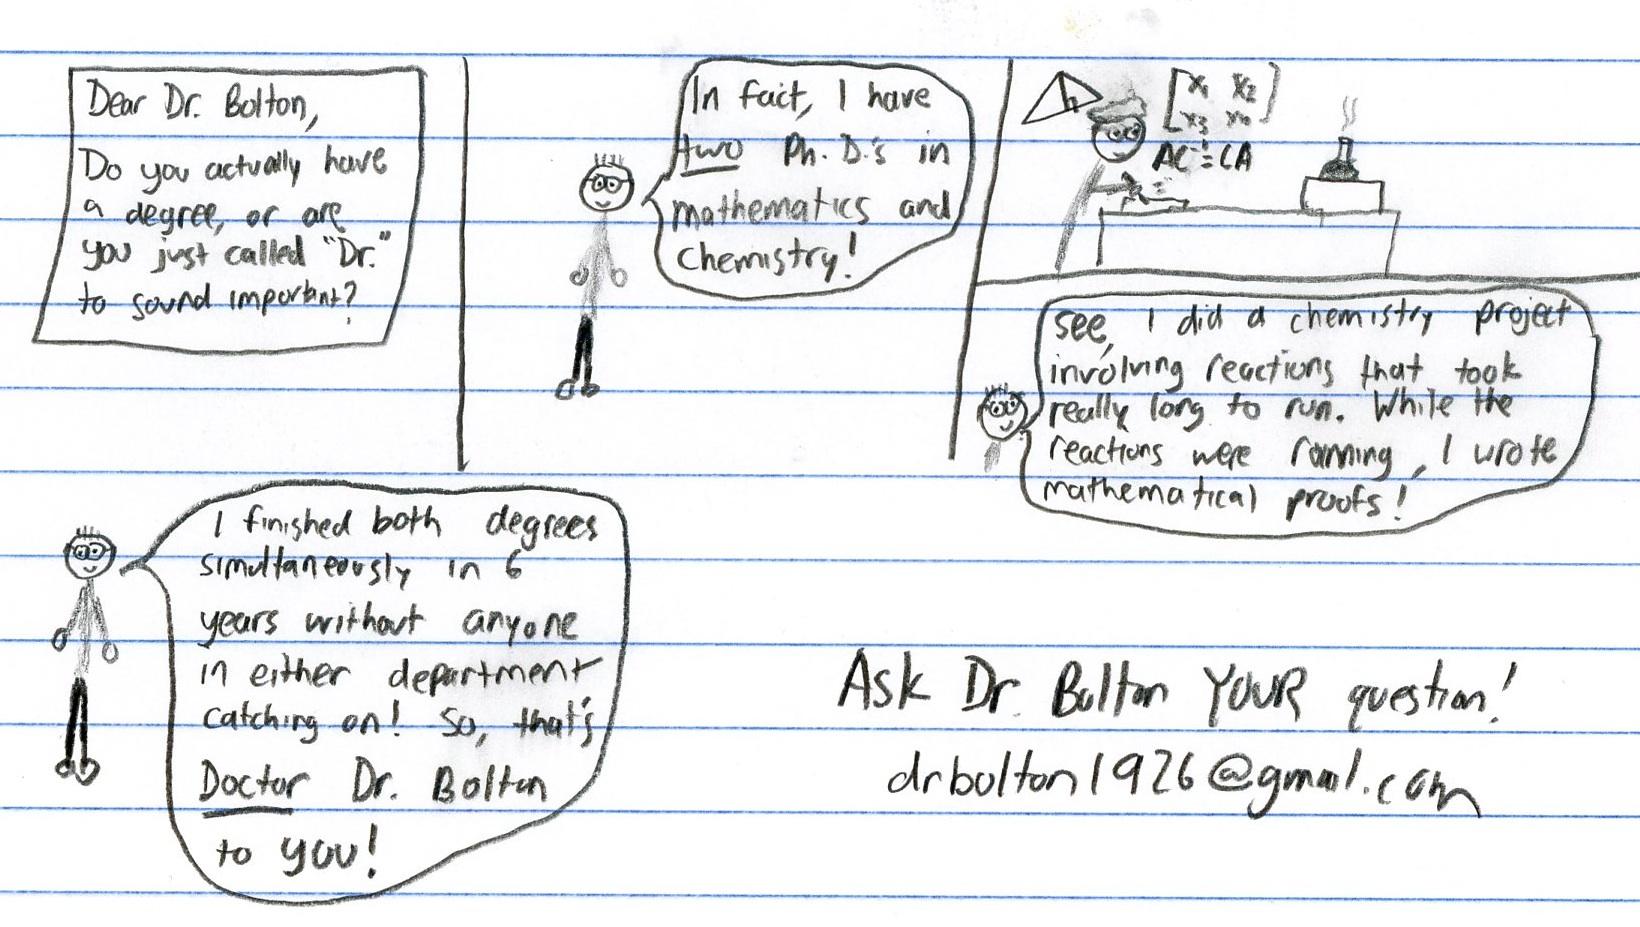 Dr. Bolton - Degree